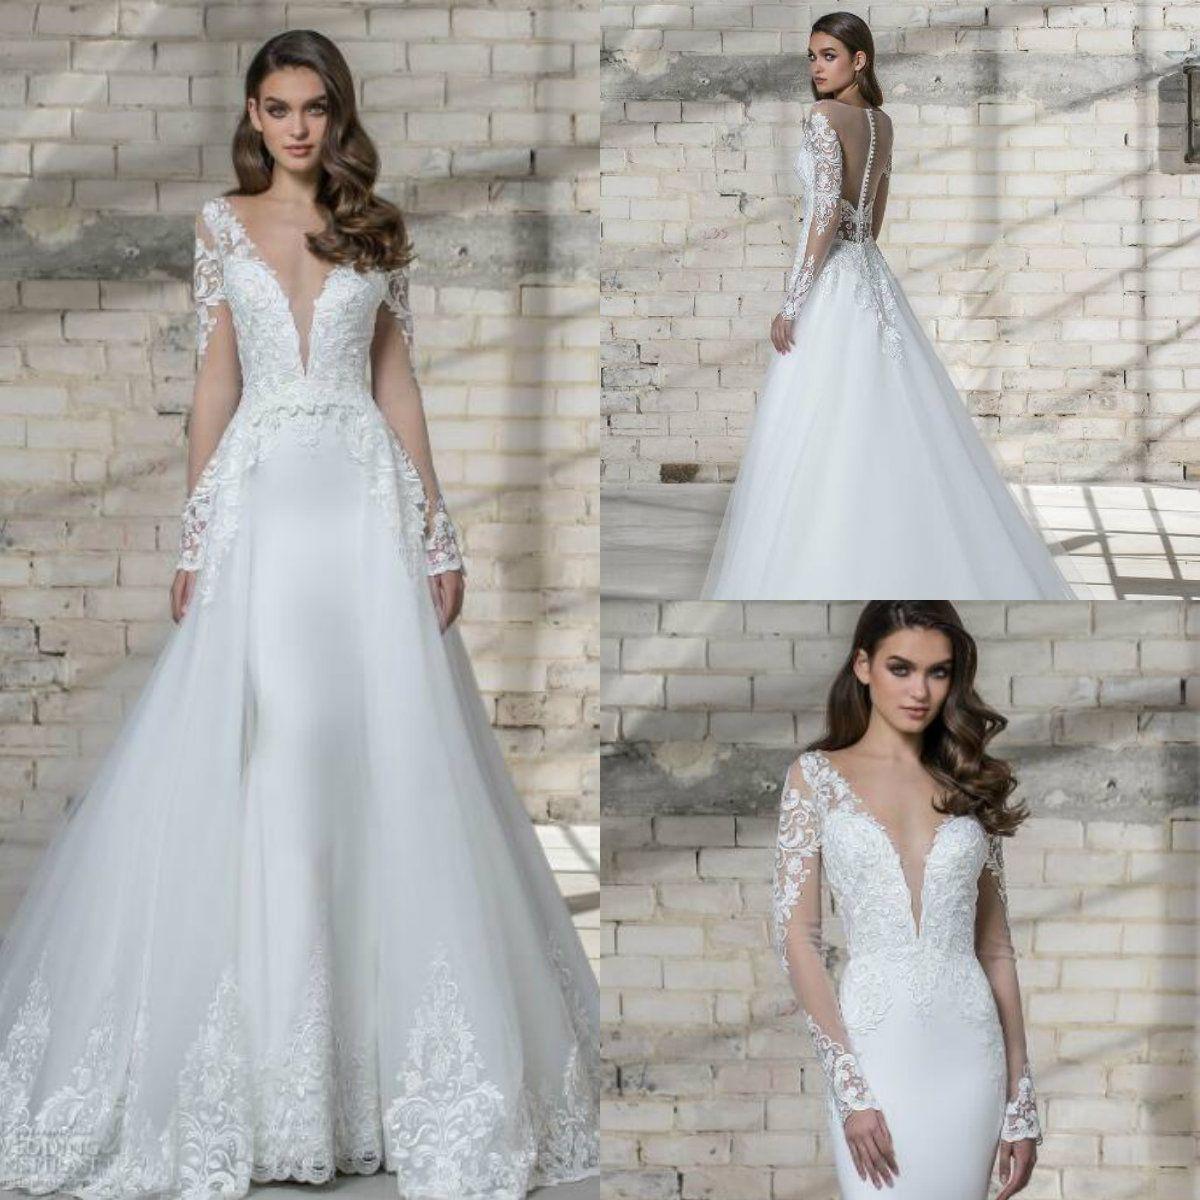 Pnina Tornai Wedding Dresses 2019: Acheter Élégante Robe De Mariée Deux Pièces Pnina Tornai